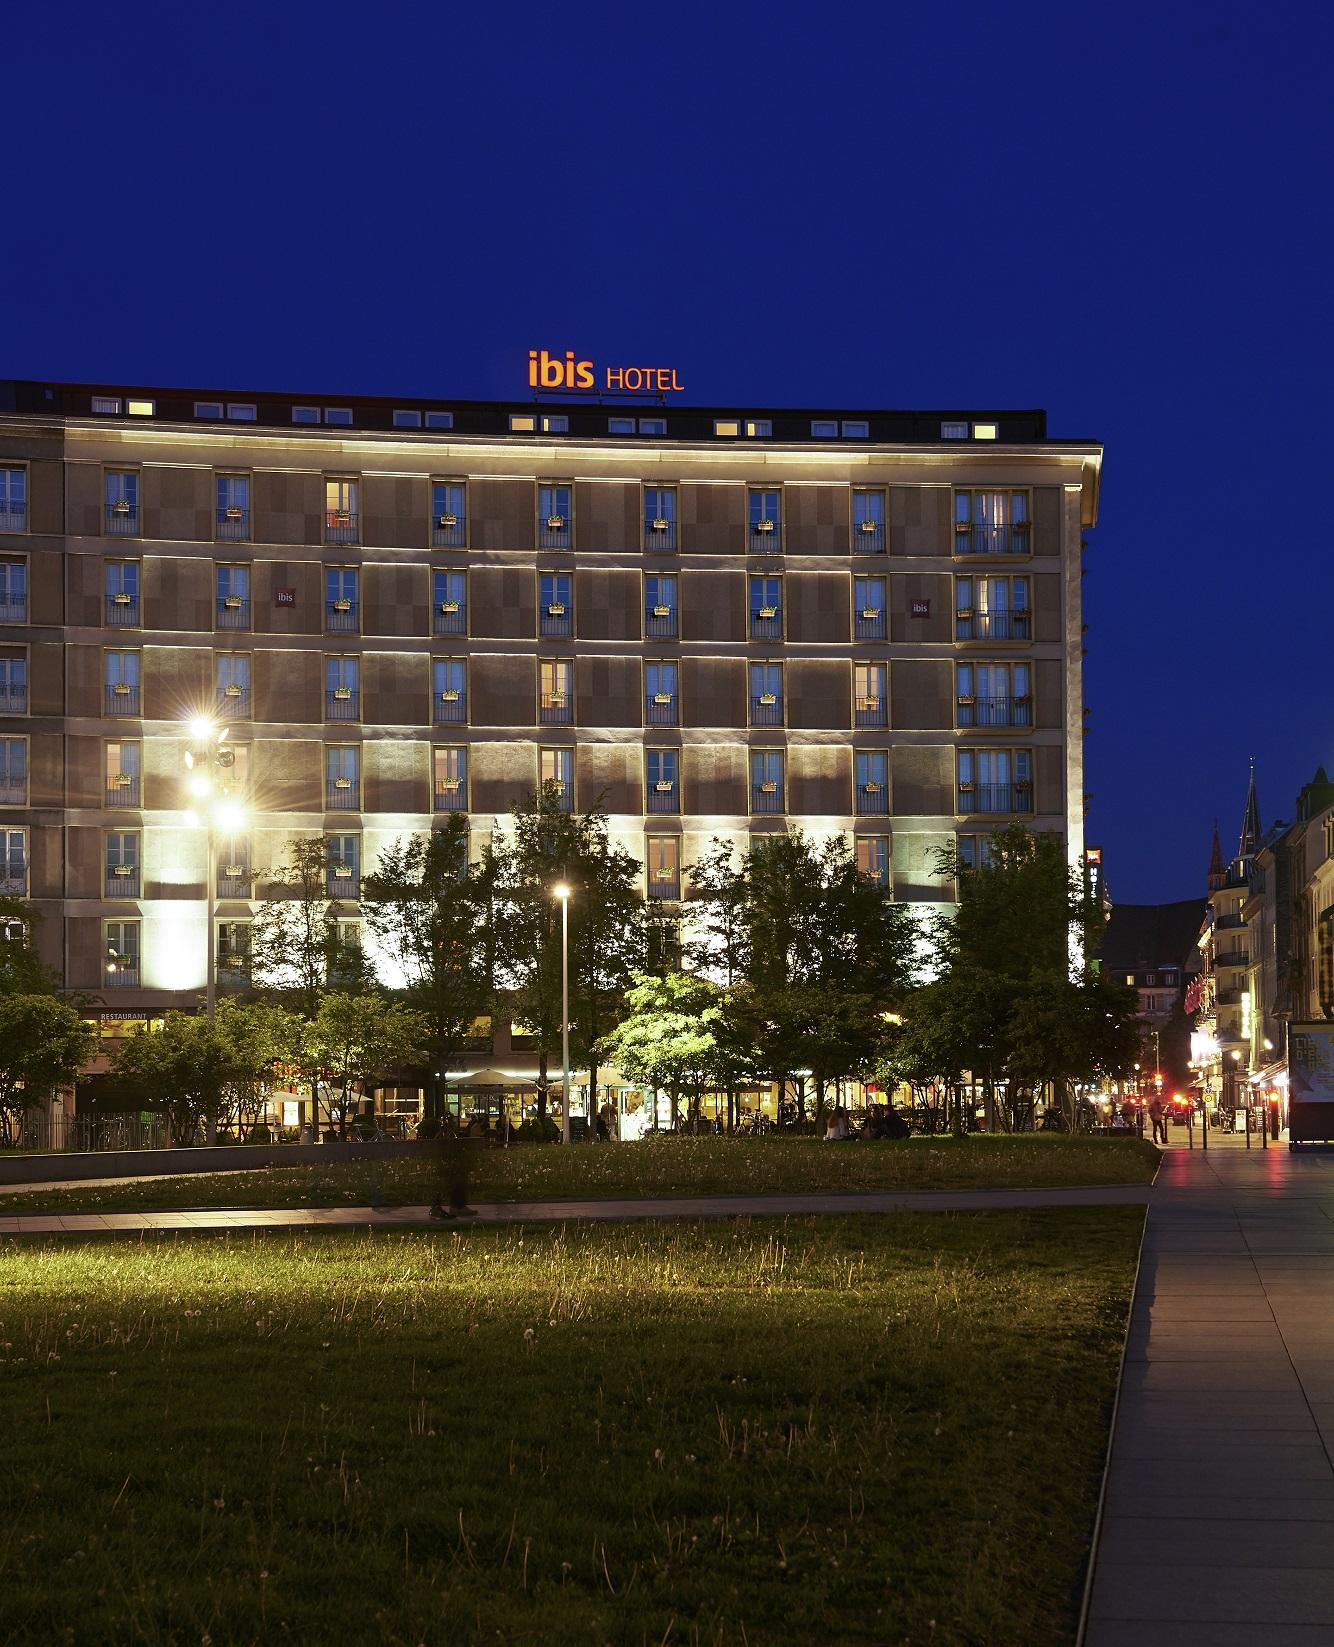 hotels ibis strasbourg centre gare for your conference in strasbourg scb. Black Bedroom Furniture Sets. Home Design Ideas